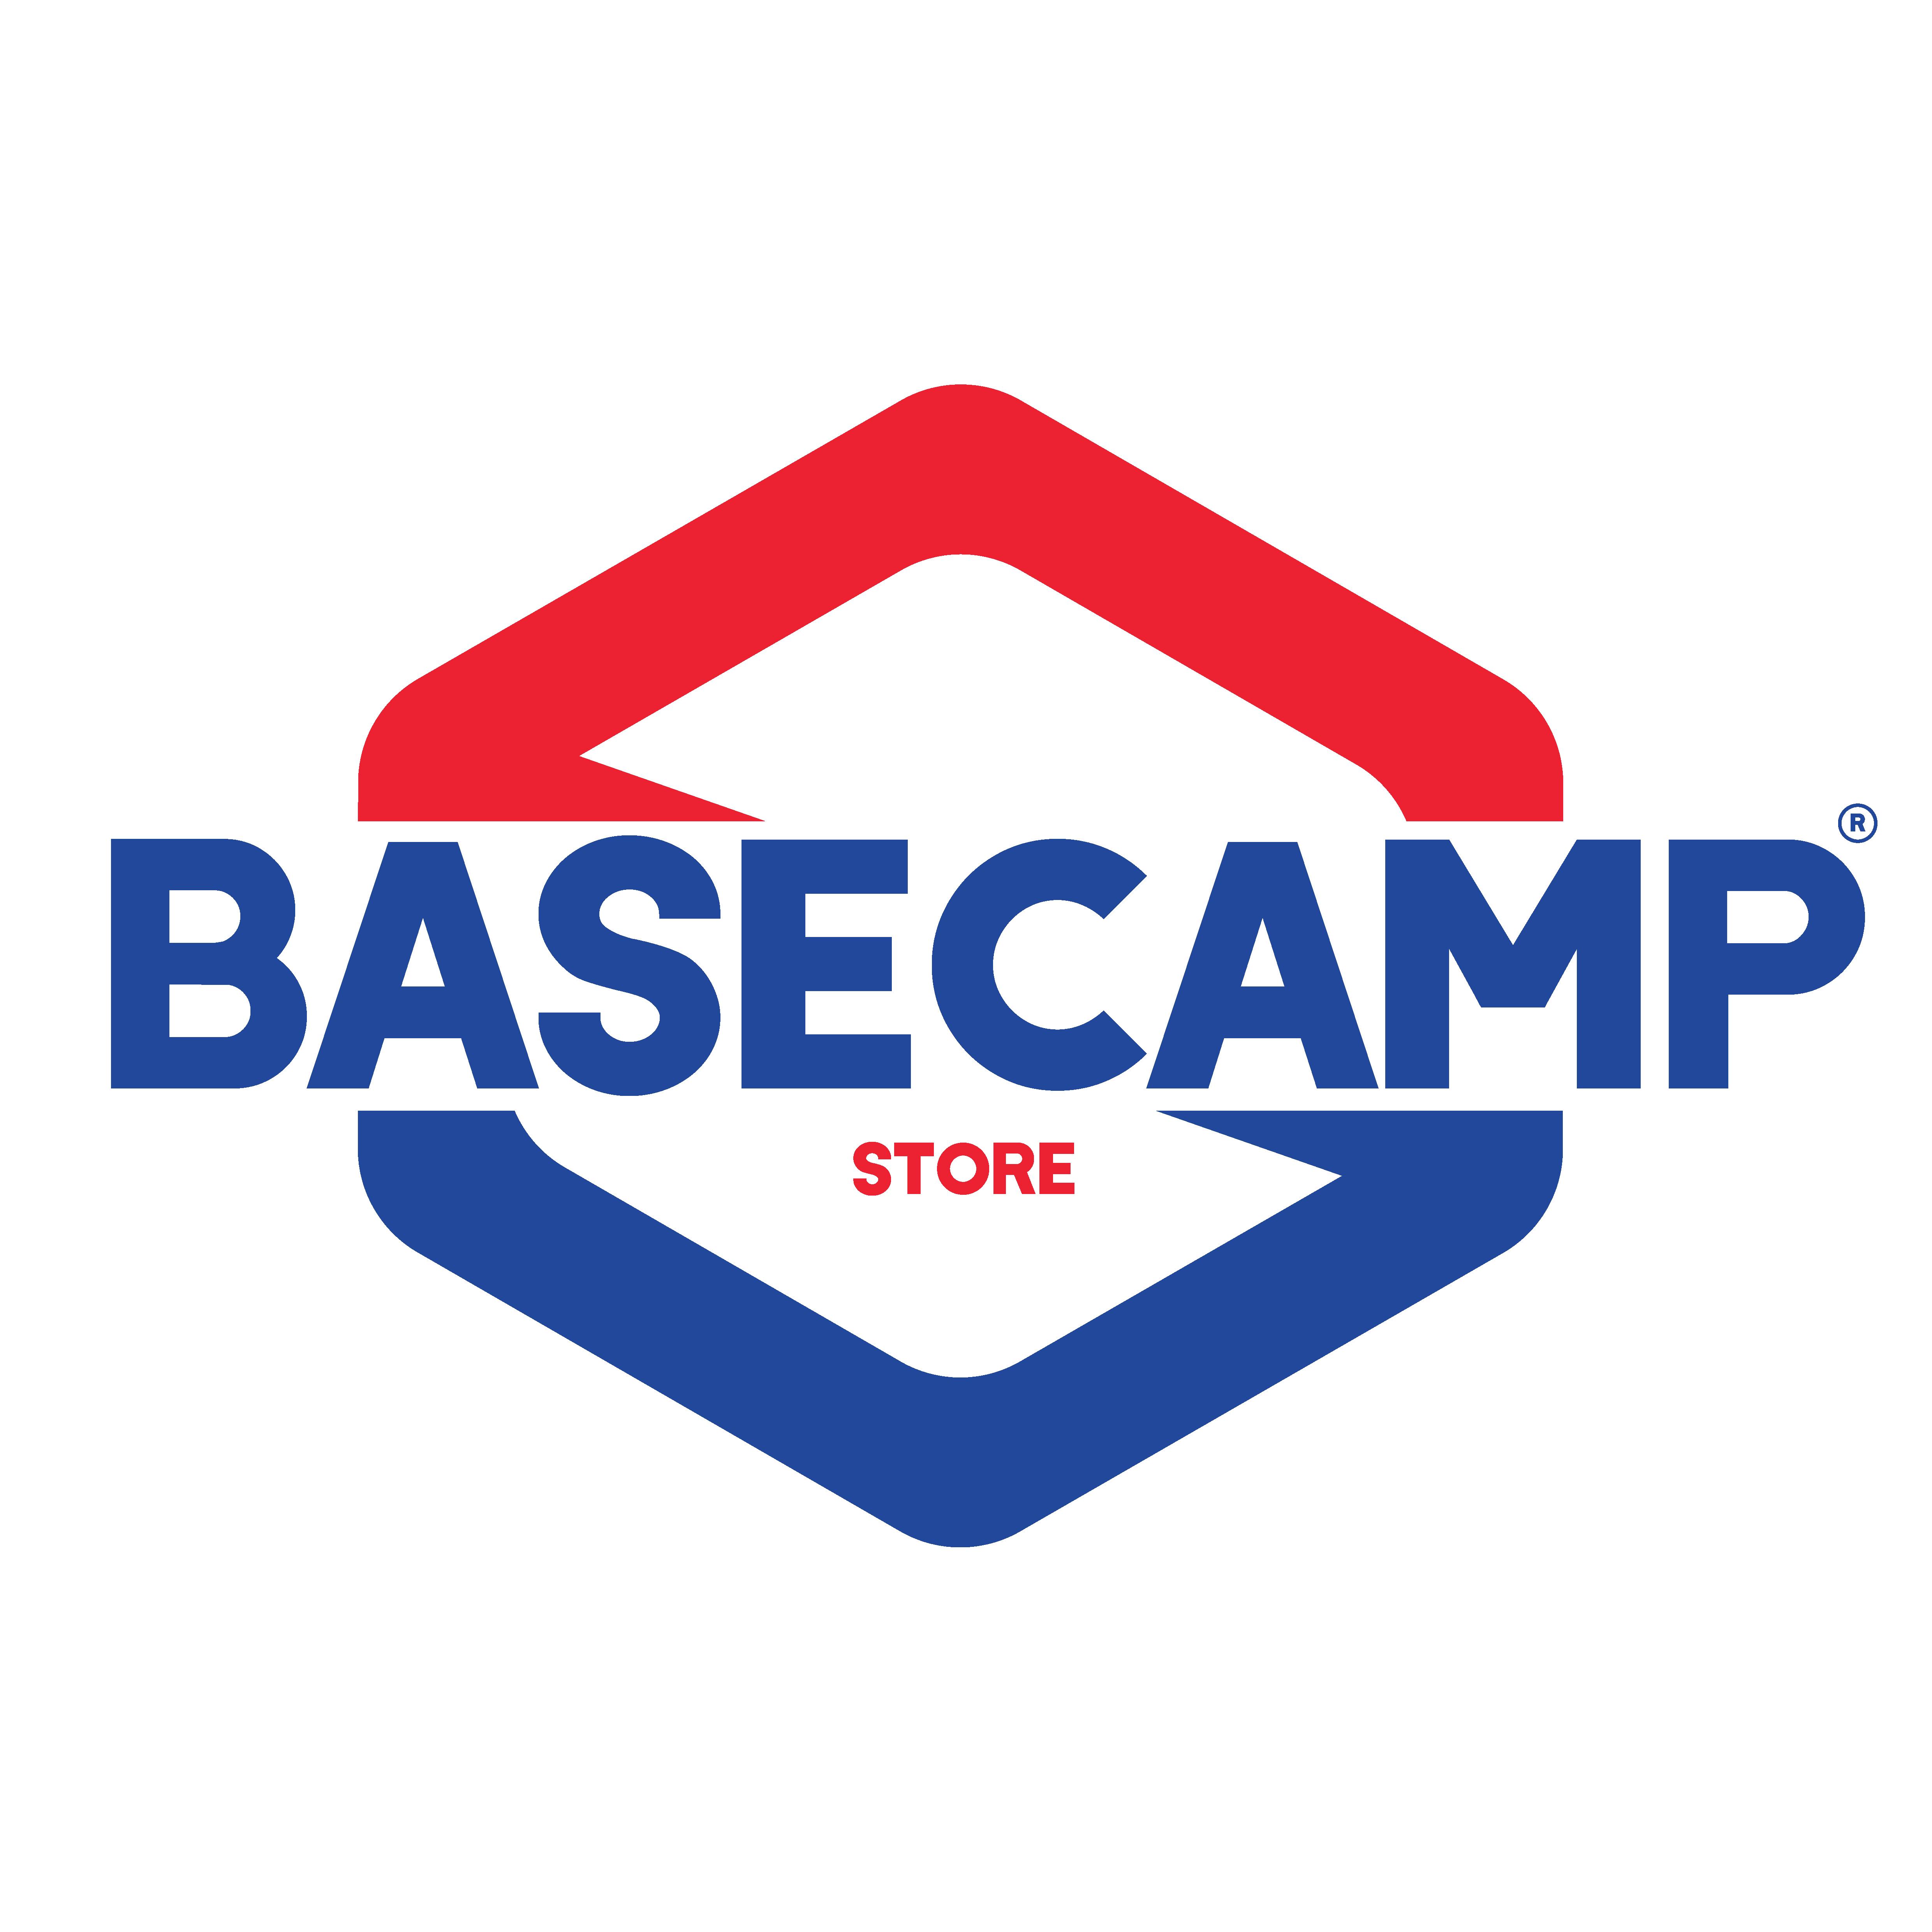 Sbasecamp